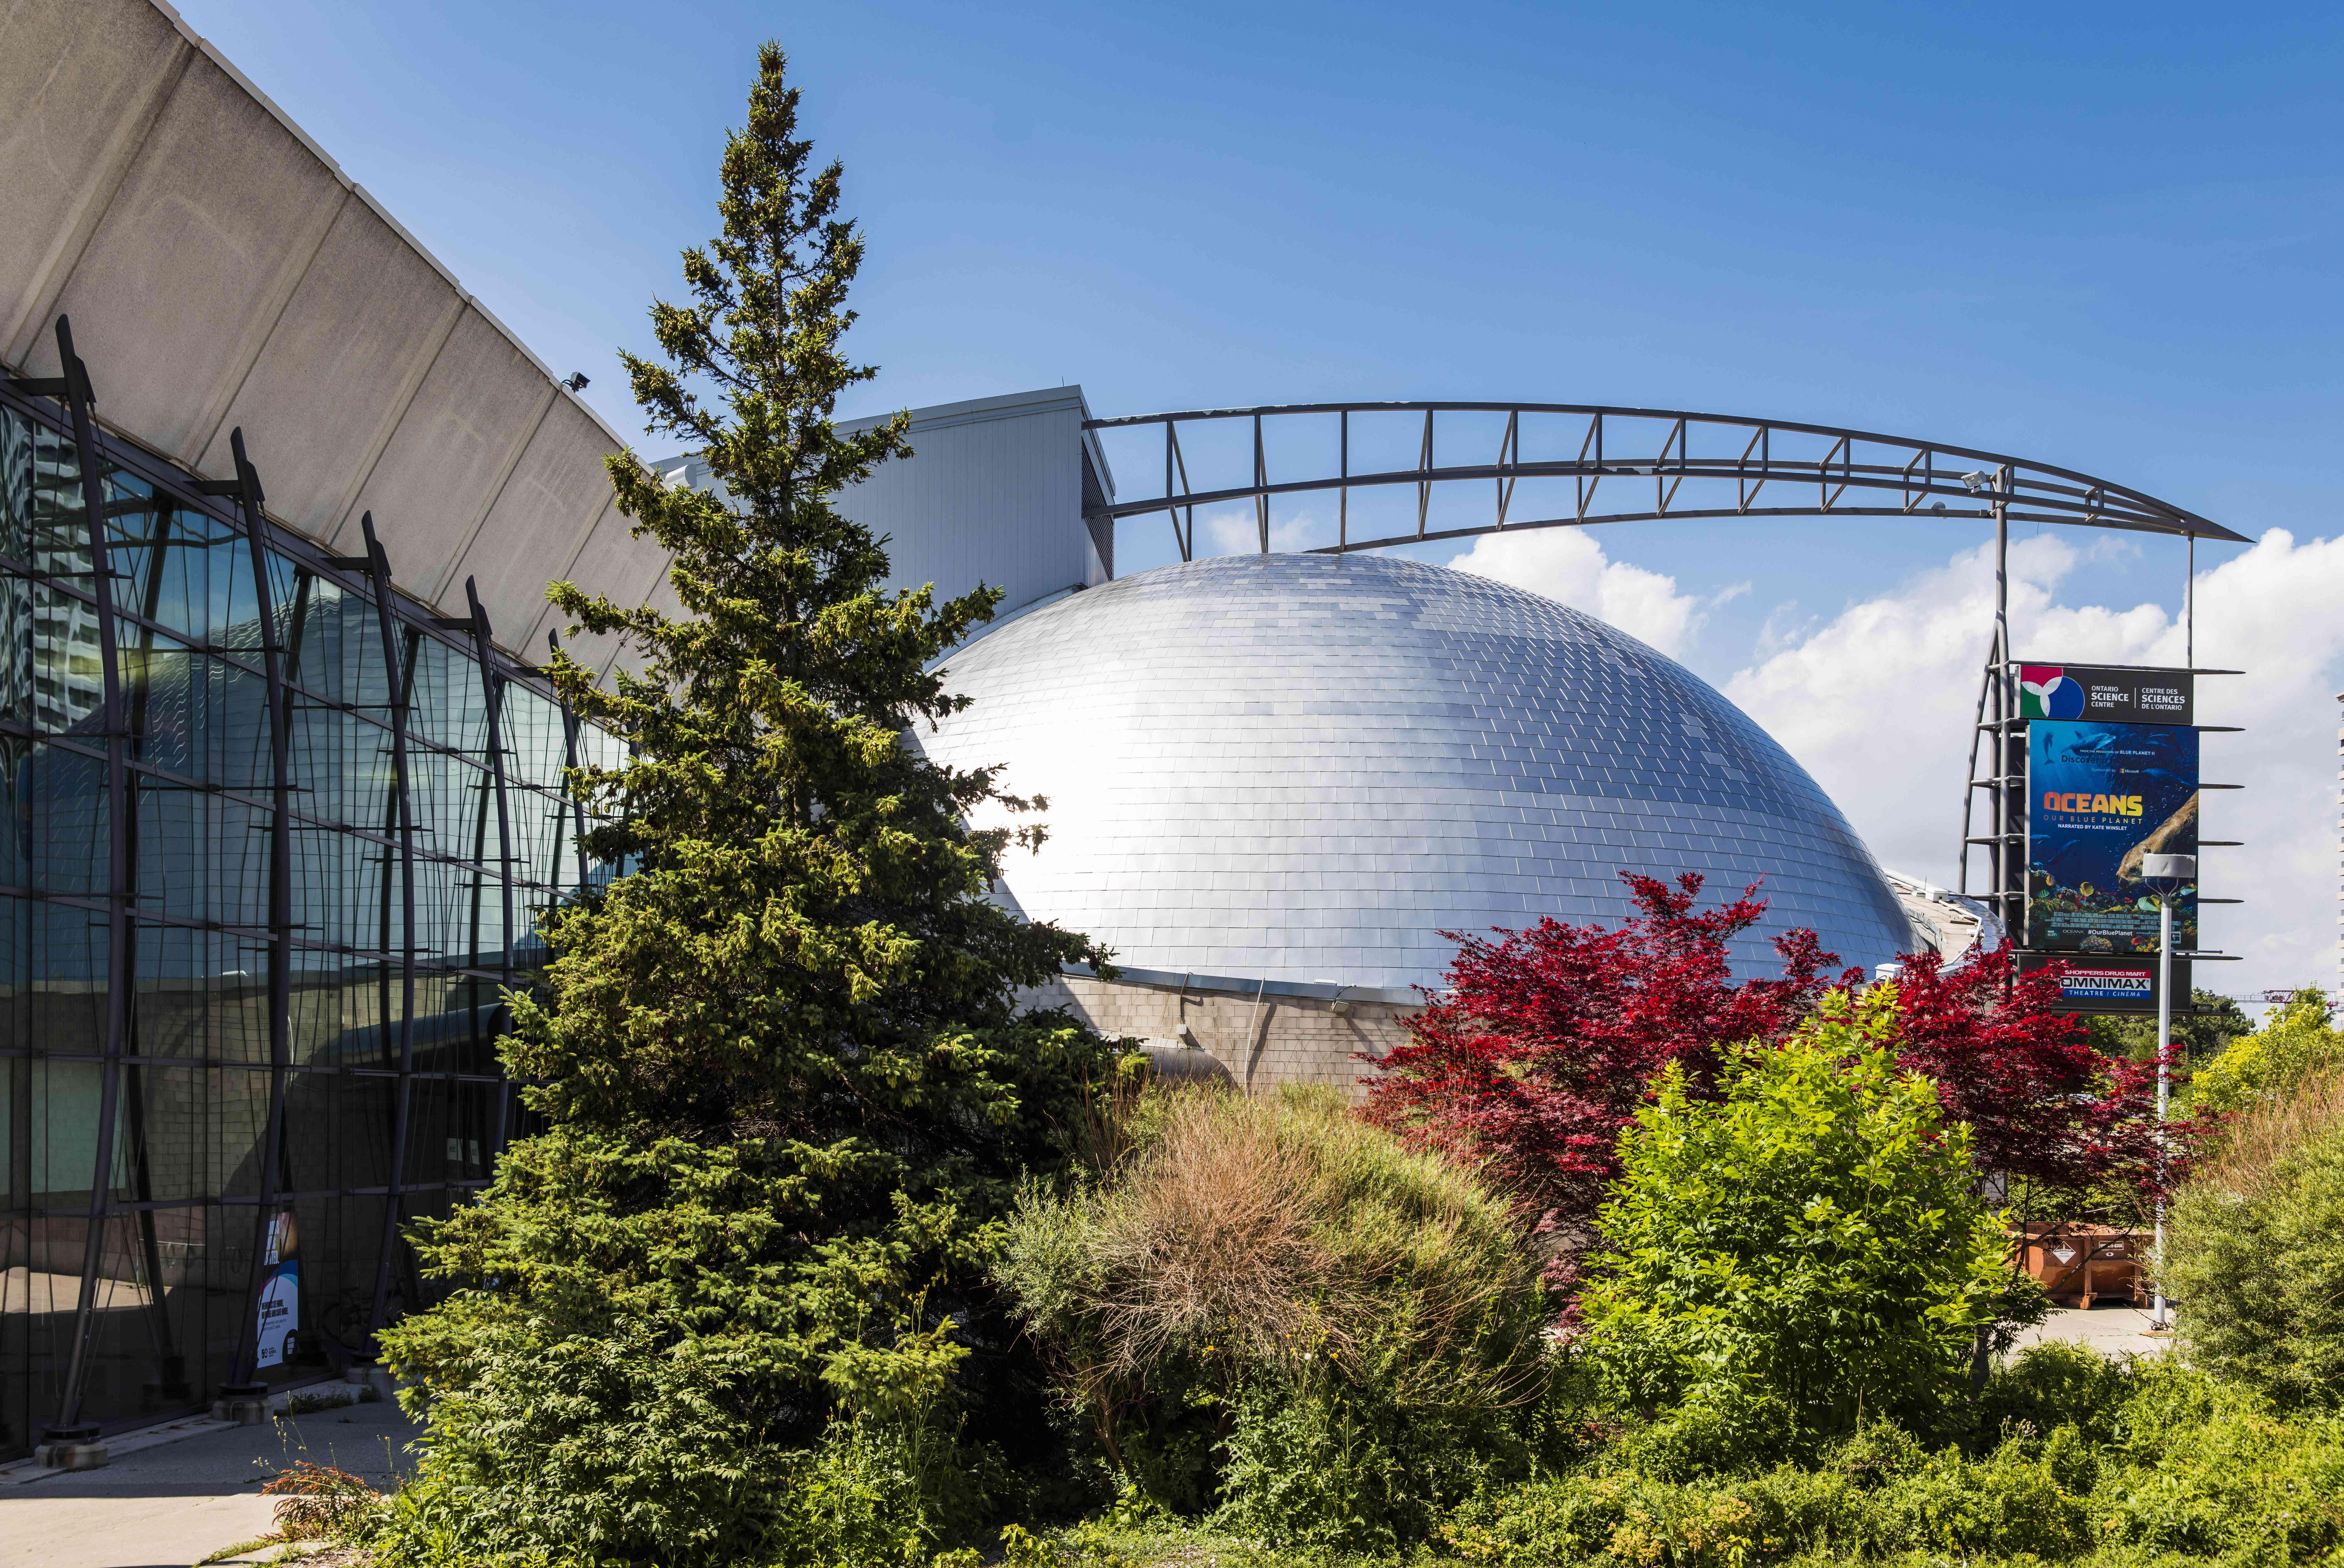 Ontario Science Center in Toronto